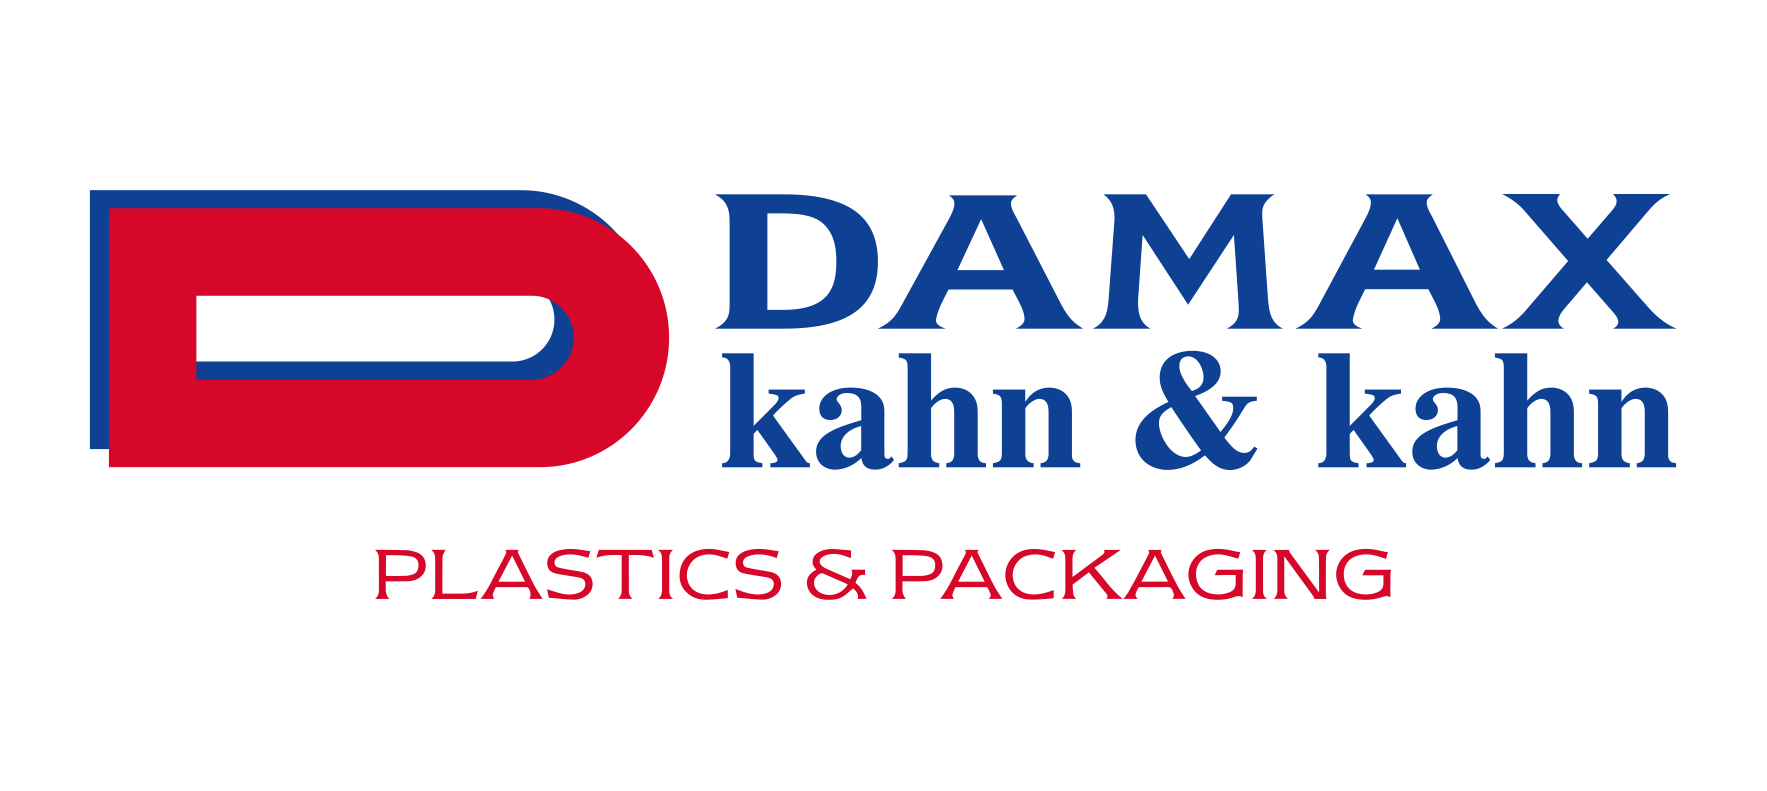 Damax Group